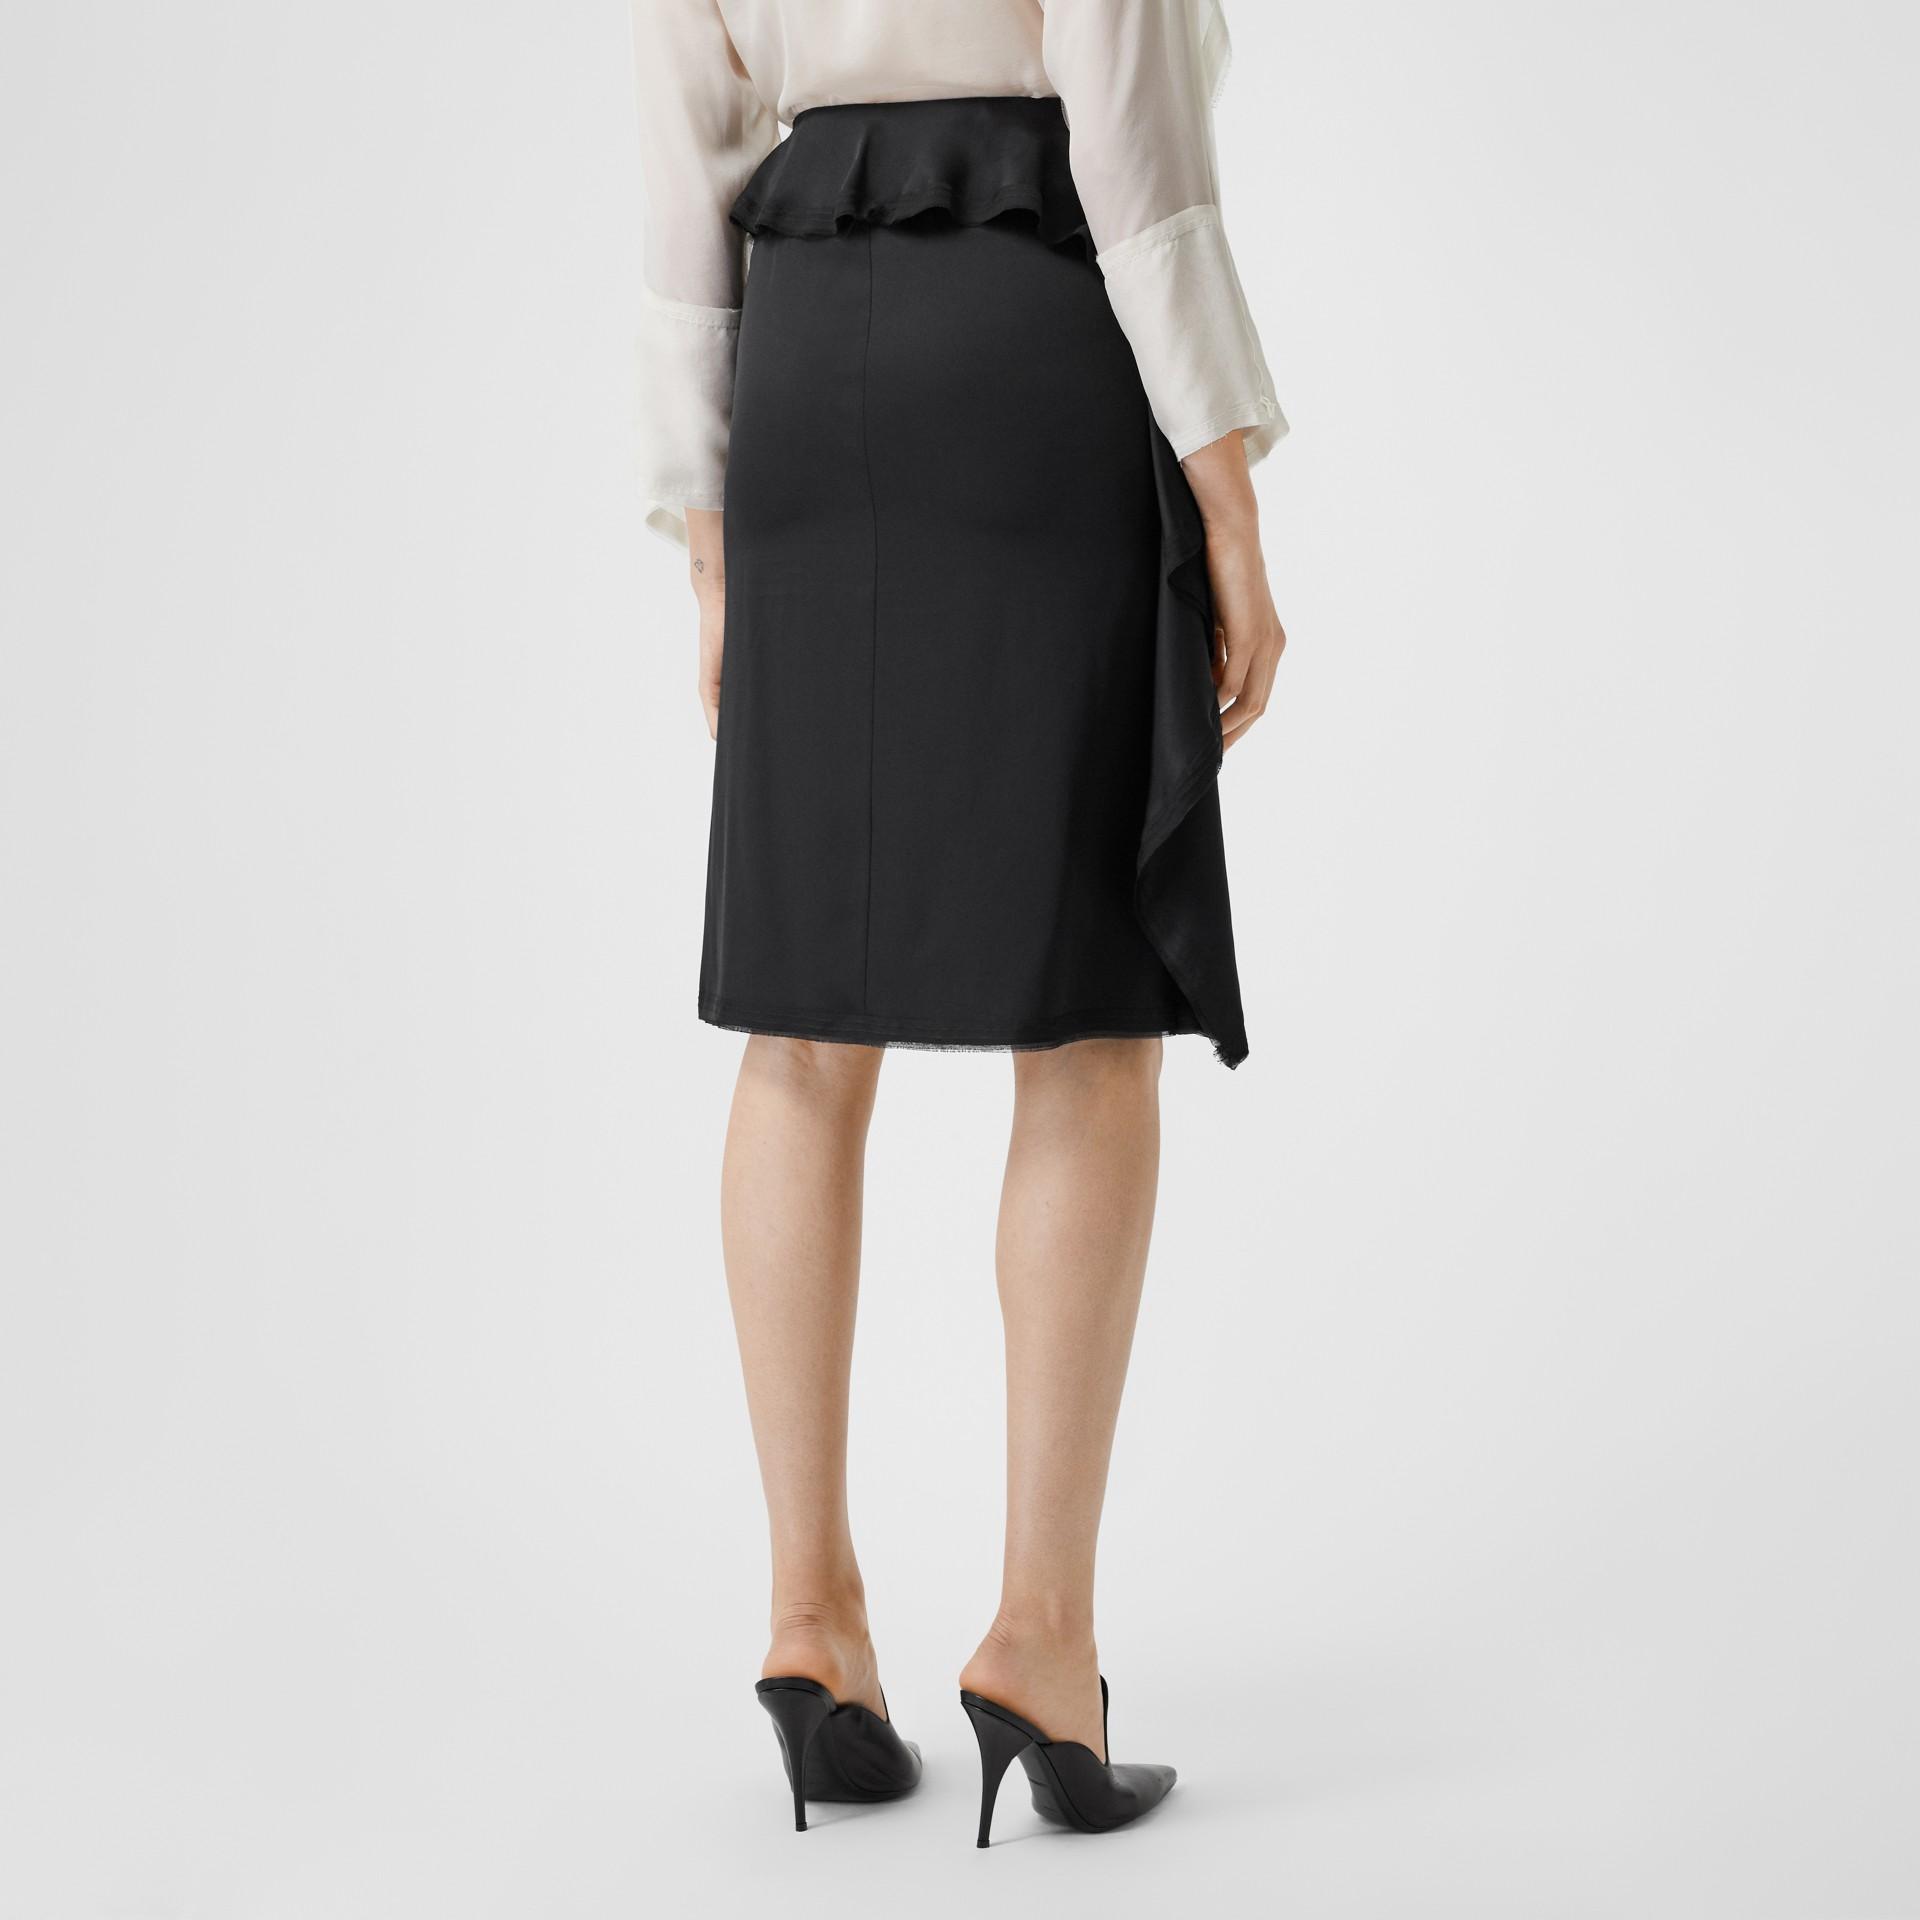 Ruffle Detail Silk Satin Pencil Skirt in Black - Women | Burberry United Kingdom - gallery image 2